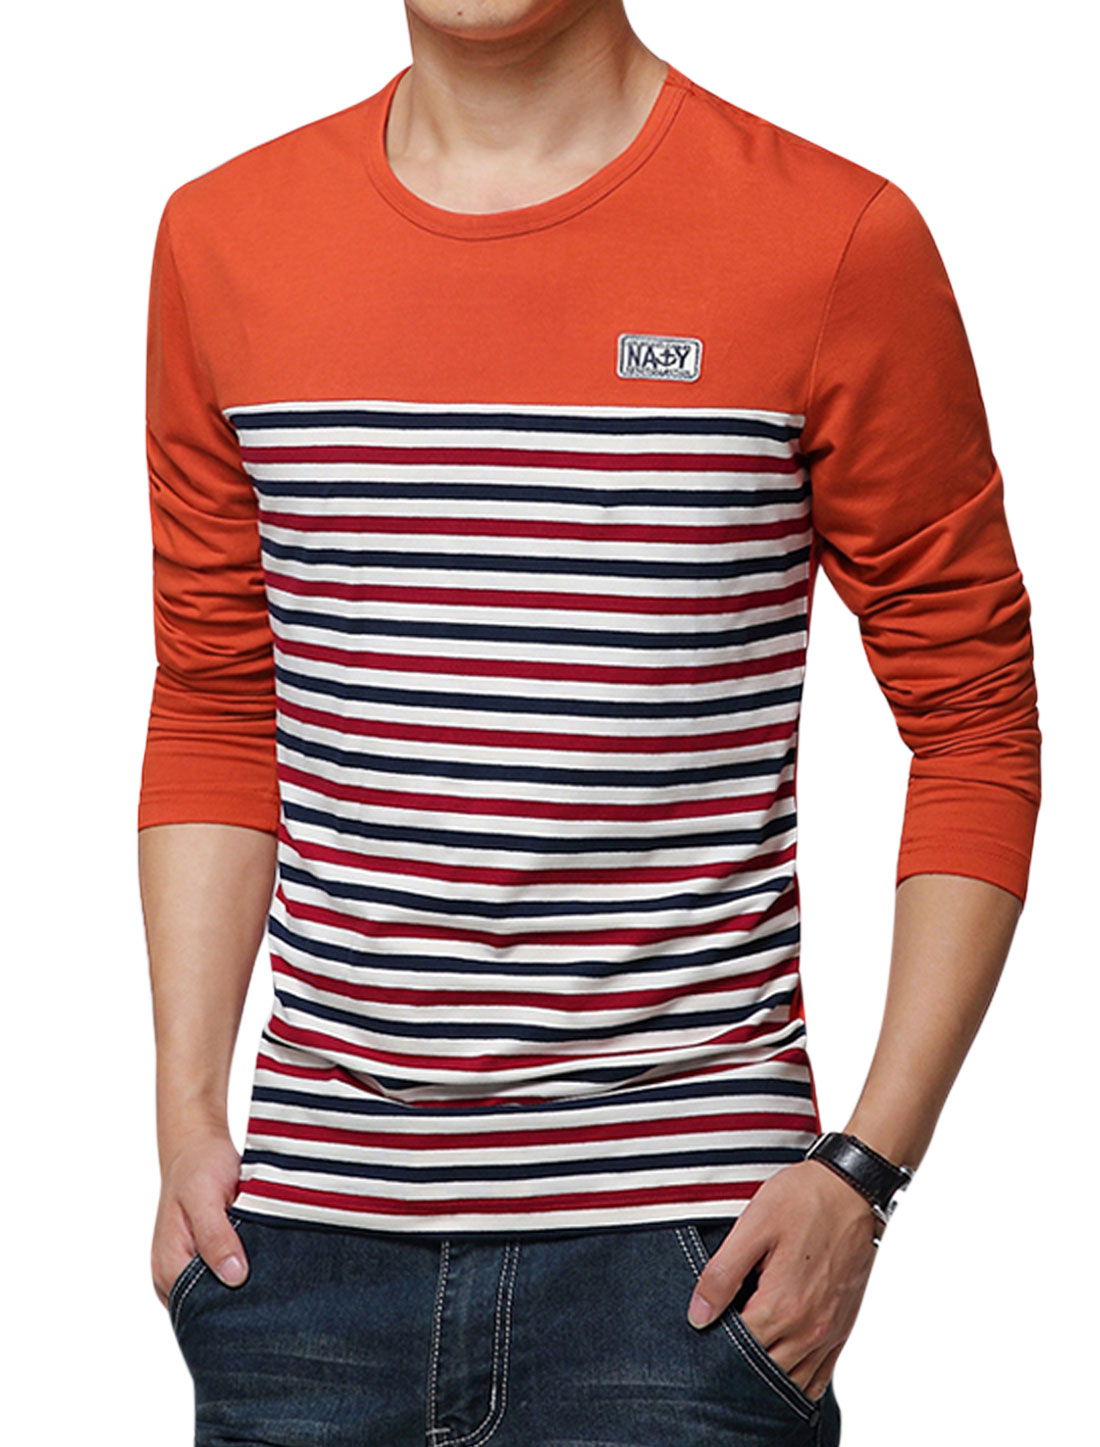 Men Round Neck Stripes Print Slim Fit T-Shirts Orange Burgundy M